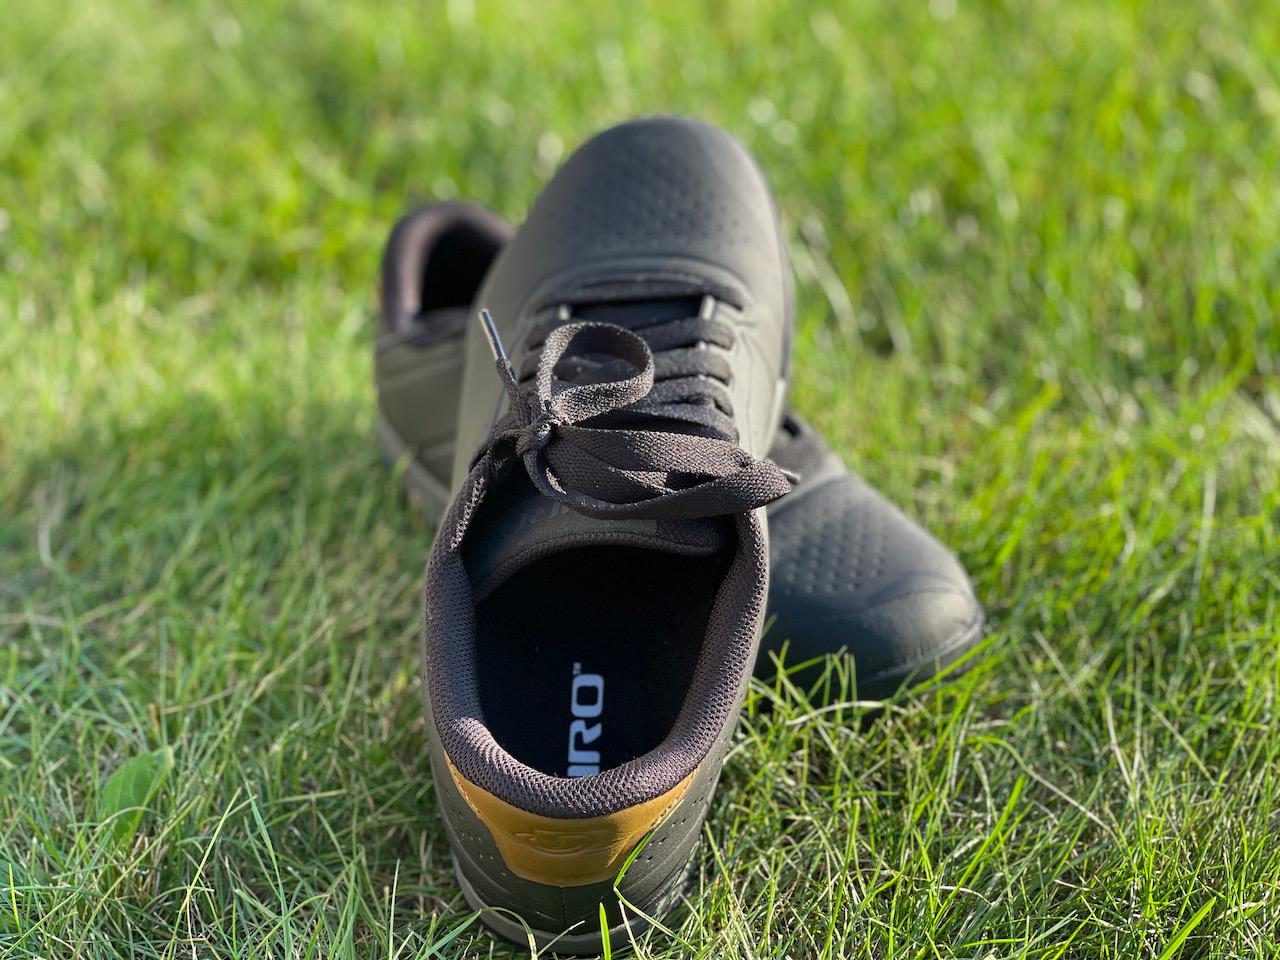 Giro Latch MTB shoes heel cup